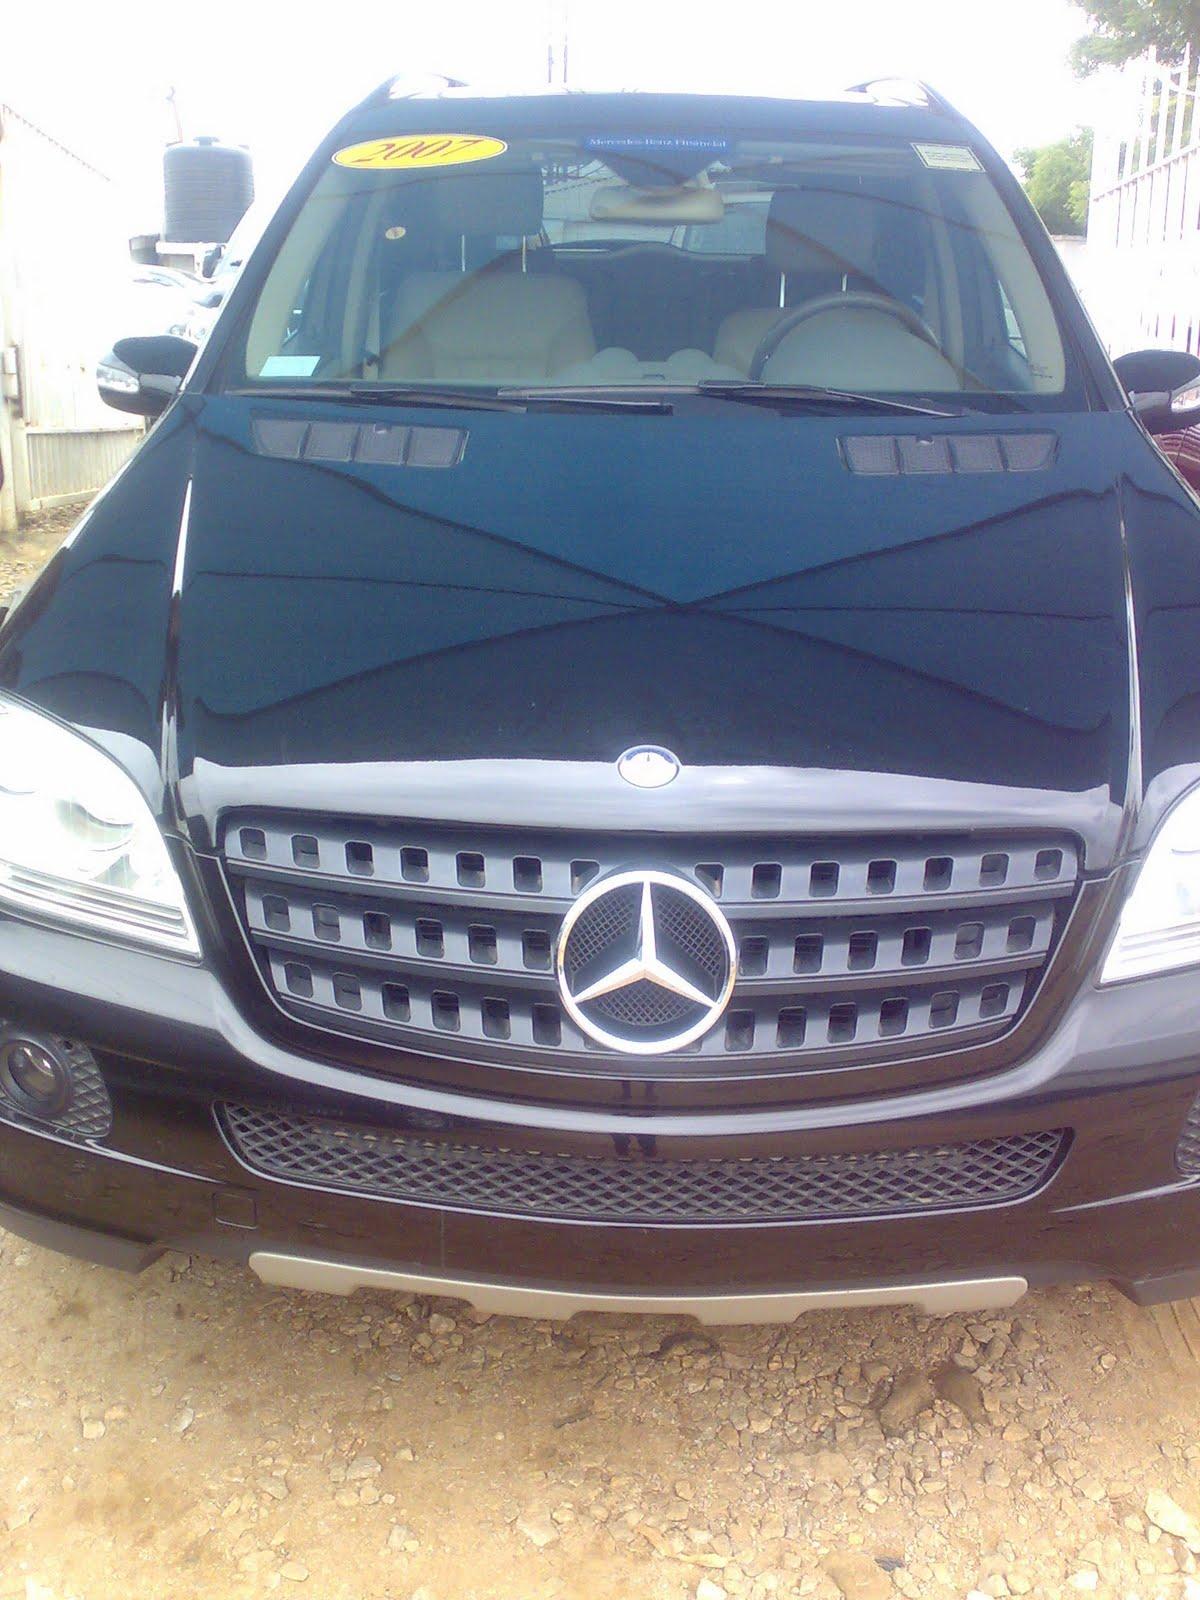 Africar international limited ml 350 mercedes benz 2006 for Mercedes benz us international